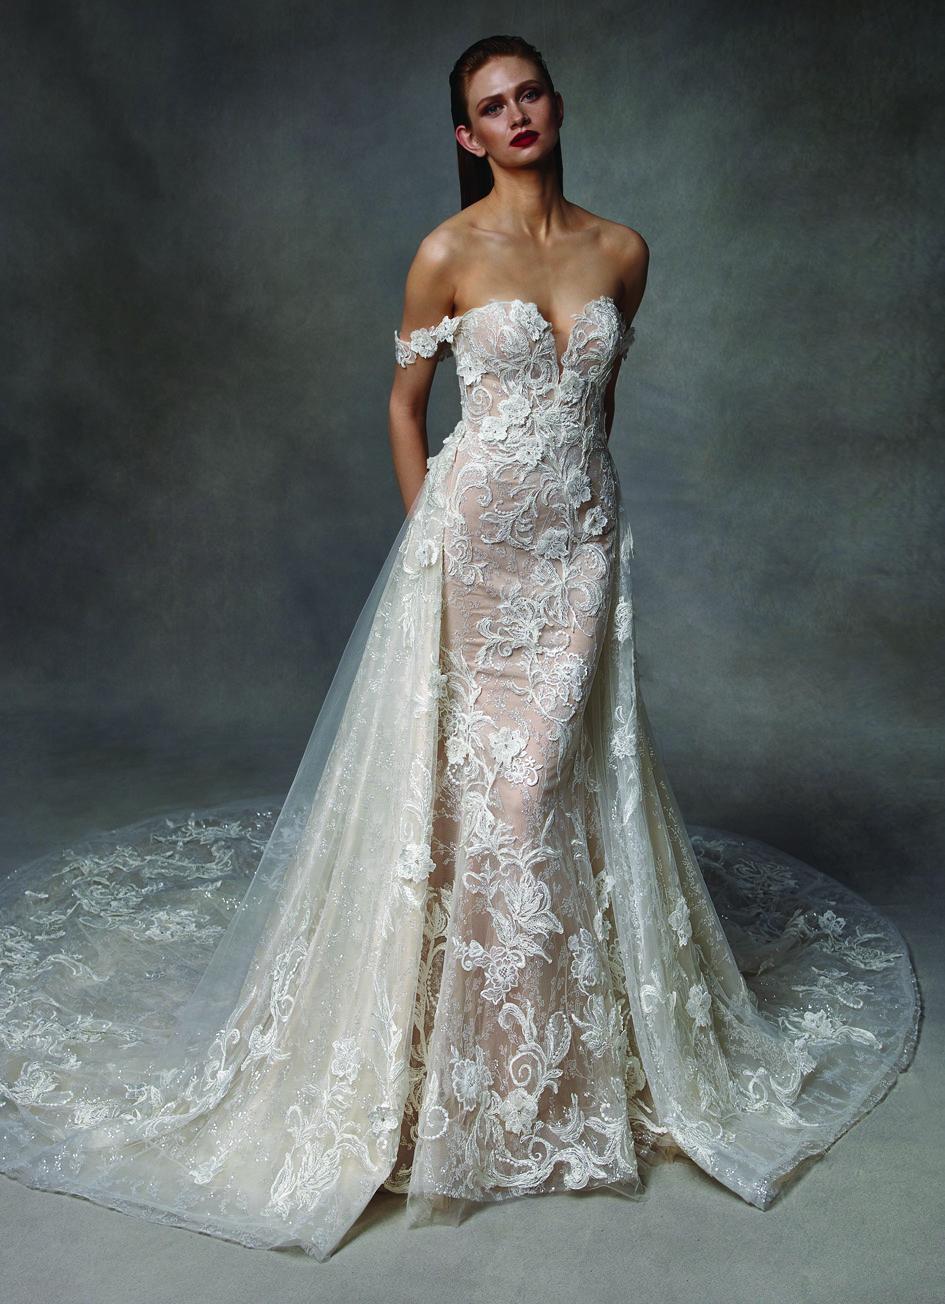 Badgley Mischka Bridal Wear Norwich Badgley Mischka,Short Wedding Dresses For Beach Ceremony